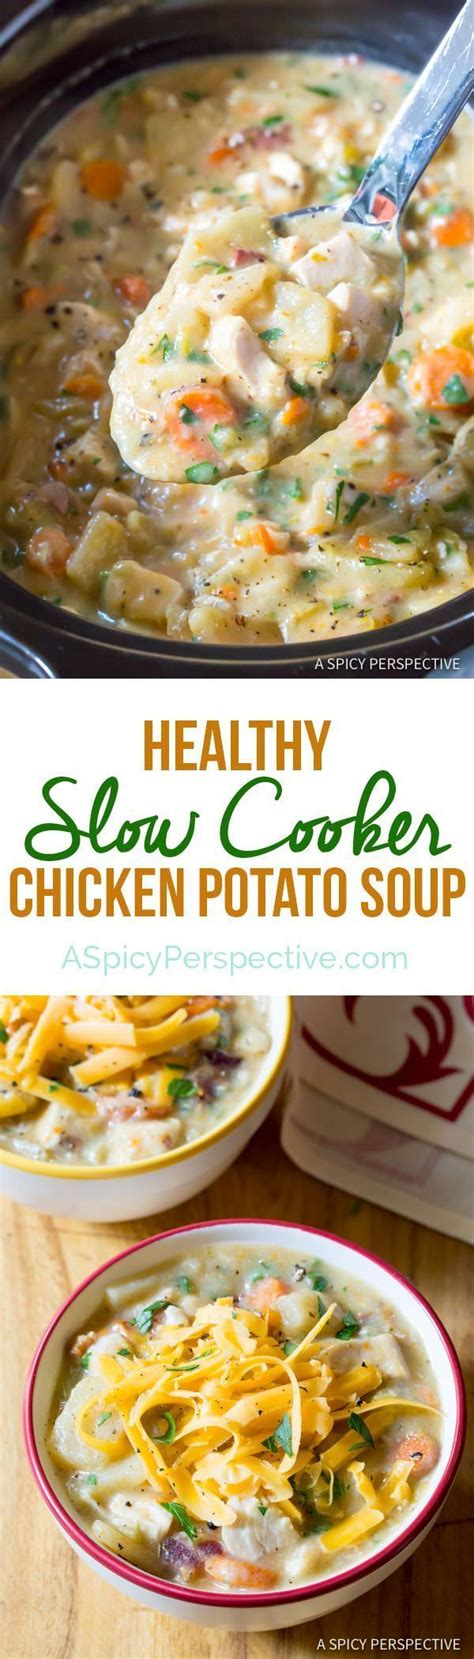 Http Www Aspicyperspective Southwest Chicken Detox Soup 2 by 25 Best Ideas About Chicken Potatoes On